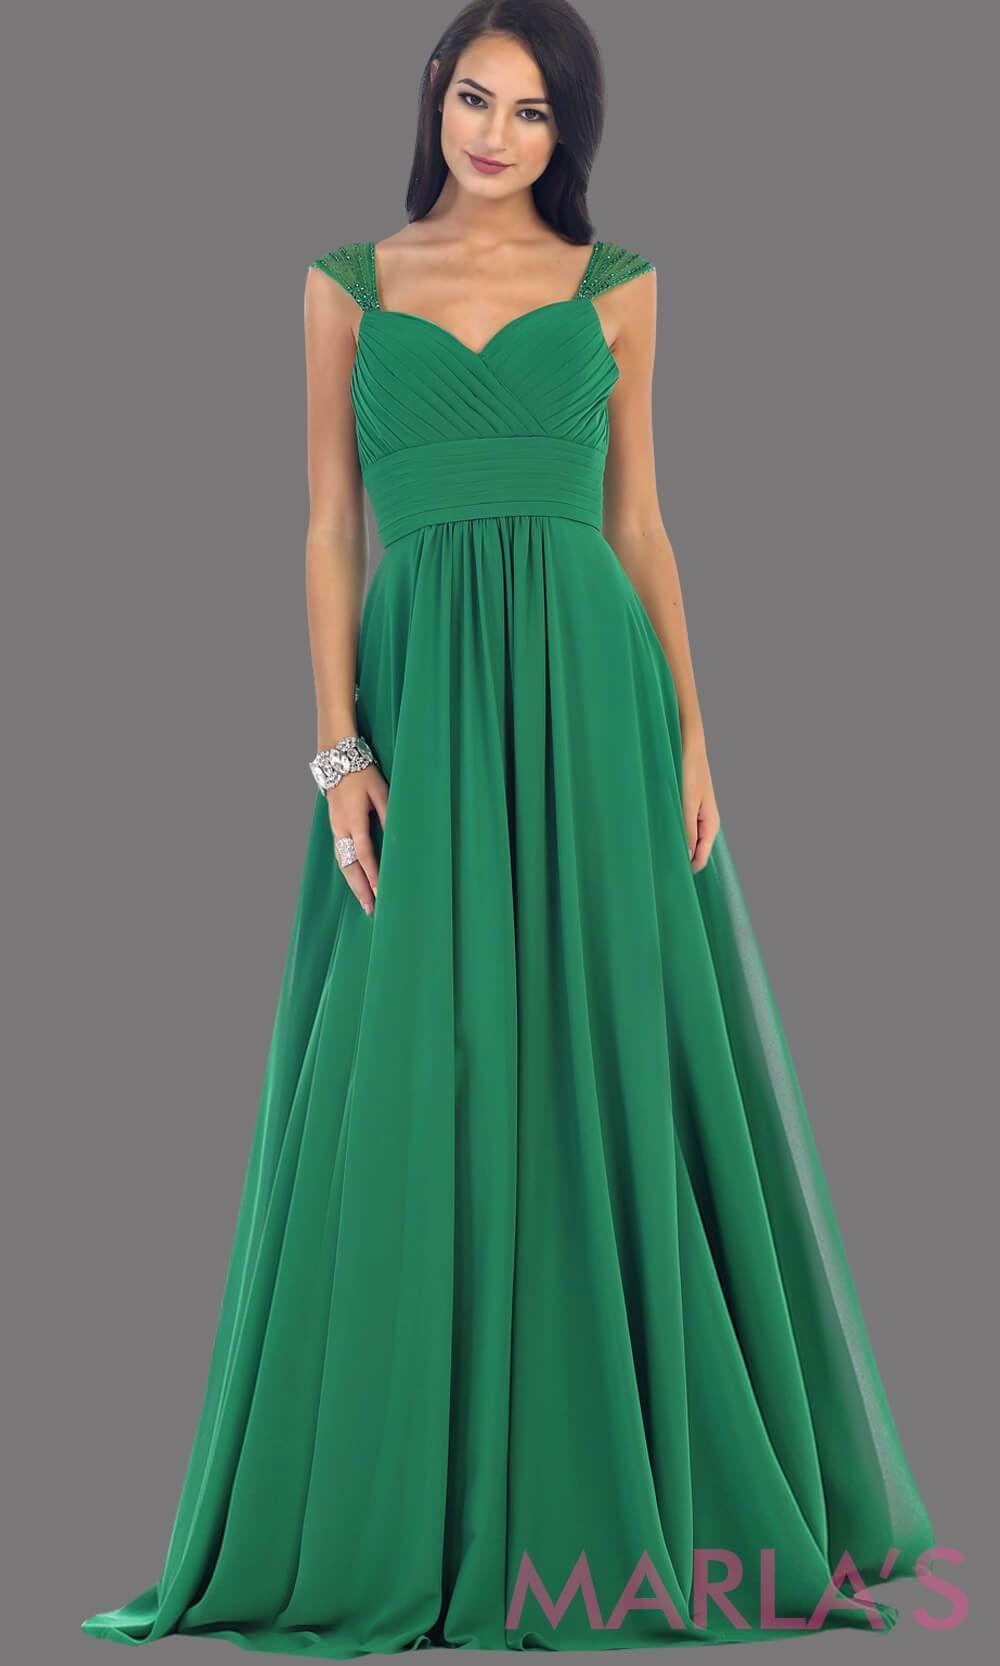 48e8f87990f7 Long Chiffon Dress with Sequin Wide Straps - Marla's Fashions - 3  #bridesmaiddresses #promdresses